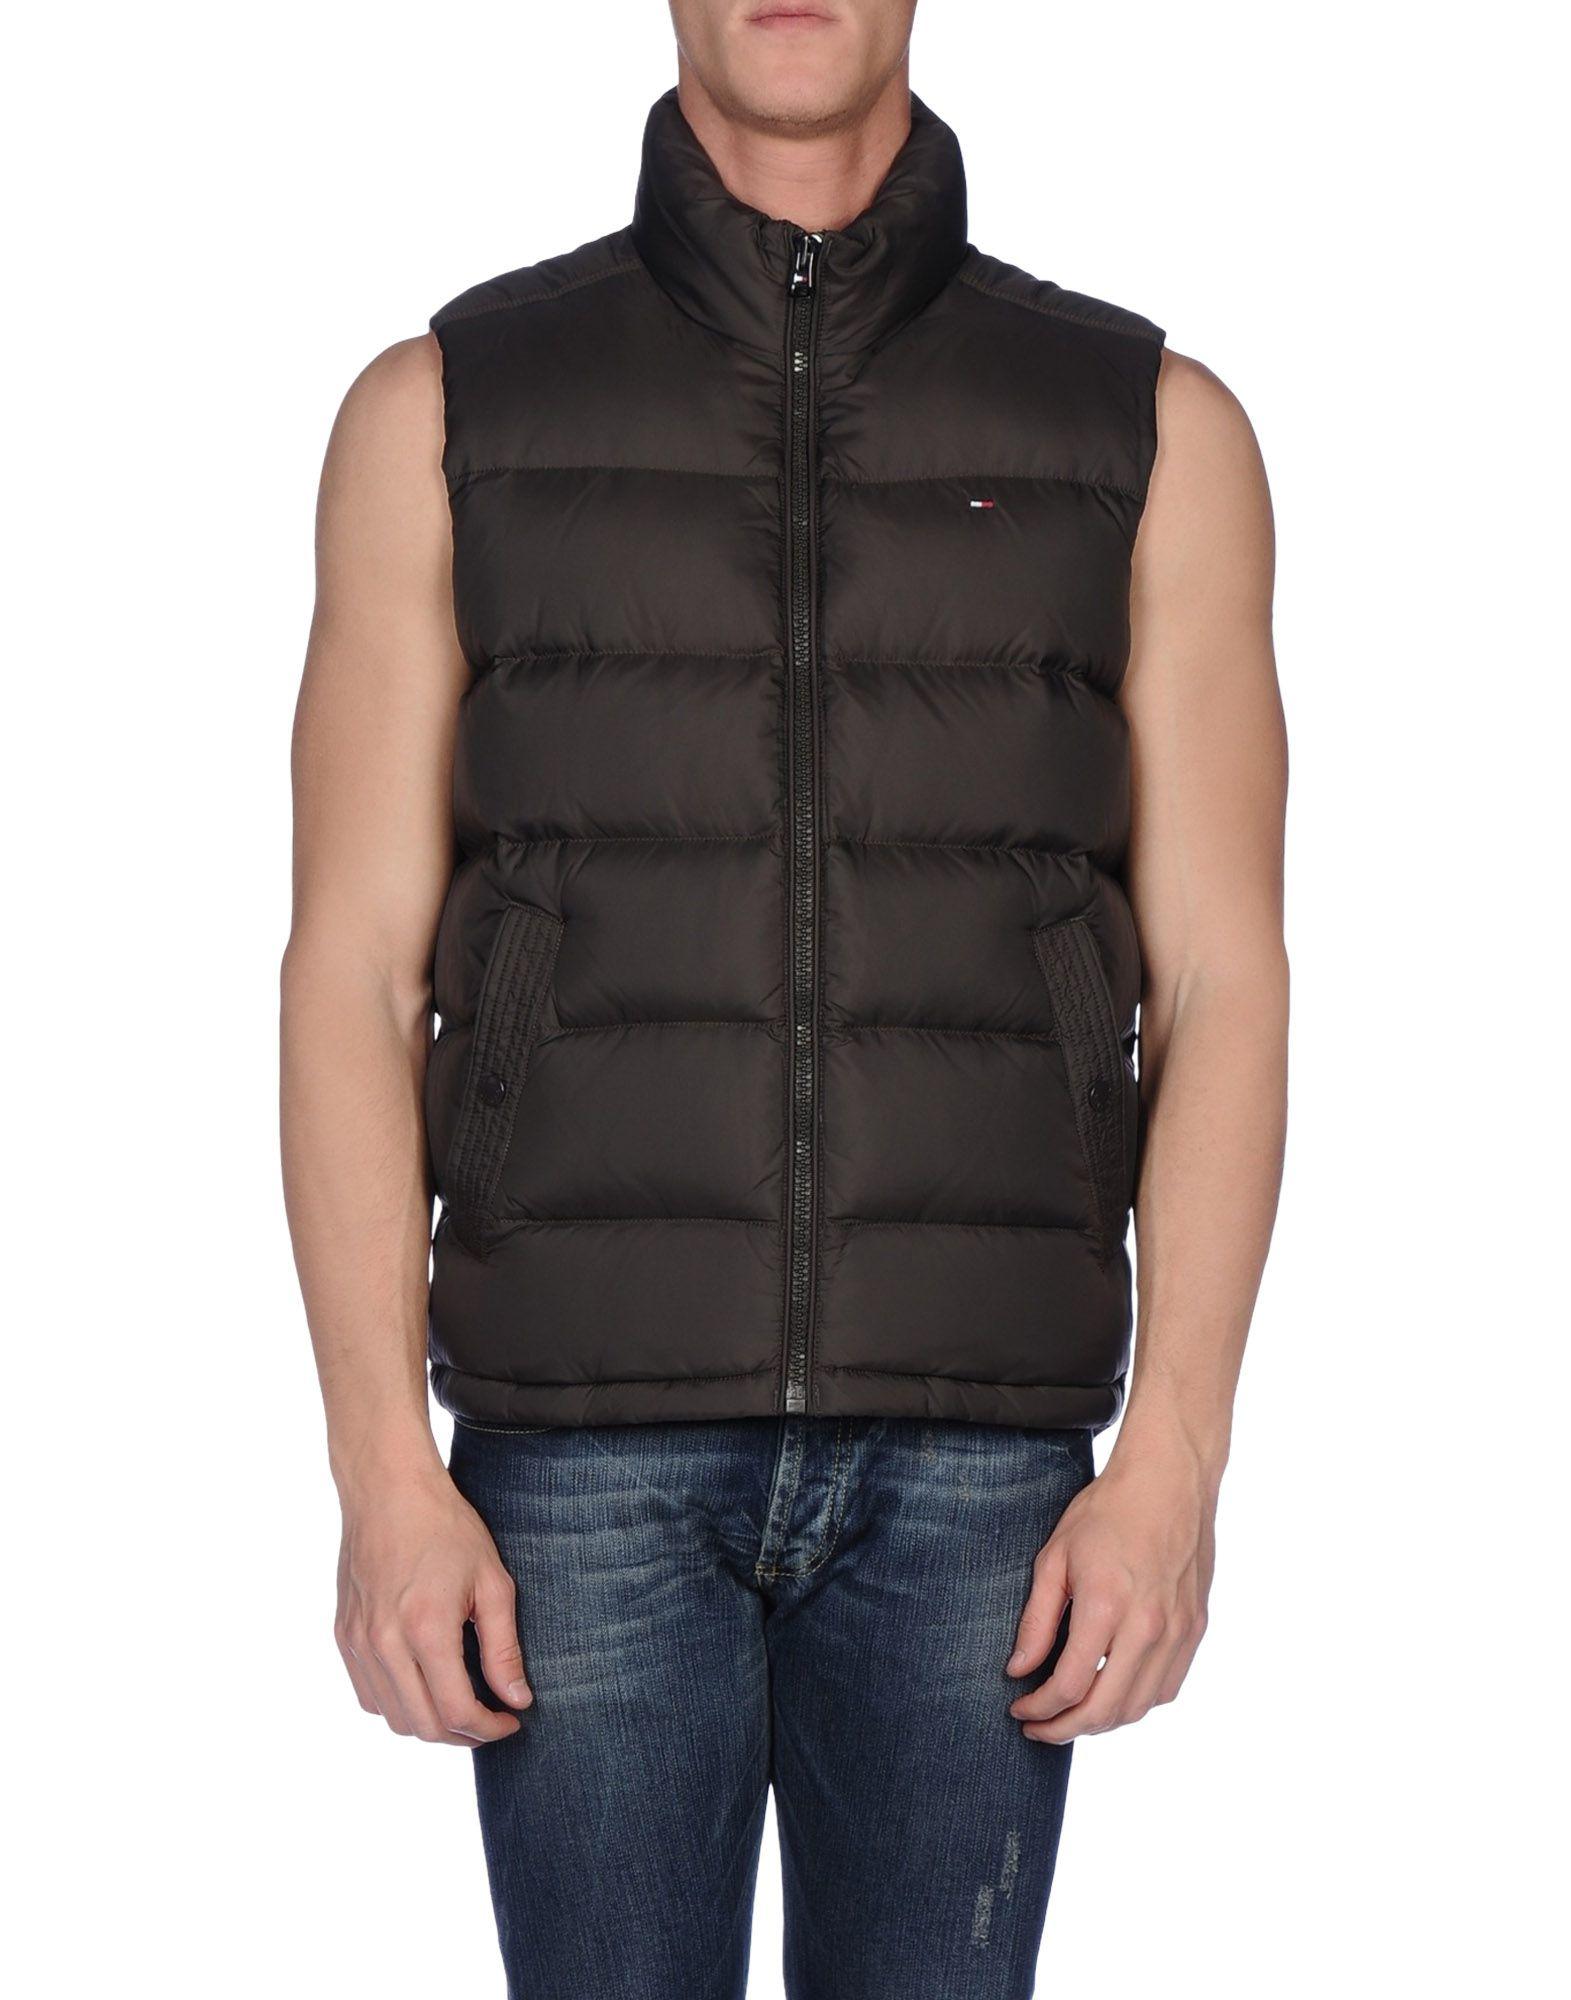 tommy hilfiger down jacket in brown for men cocoa lyst. Black Bedroom Furniture Sets. Home Design Ideas